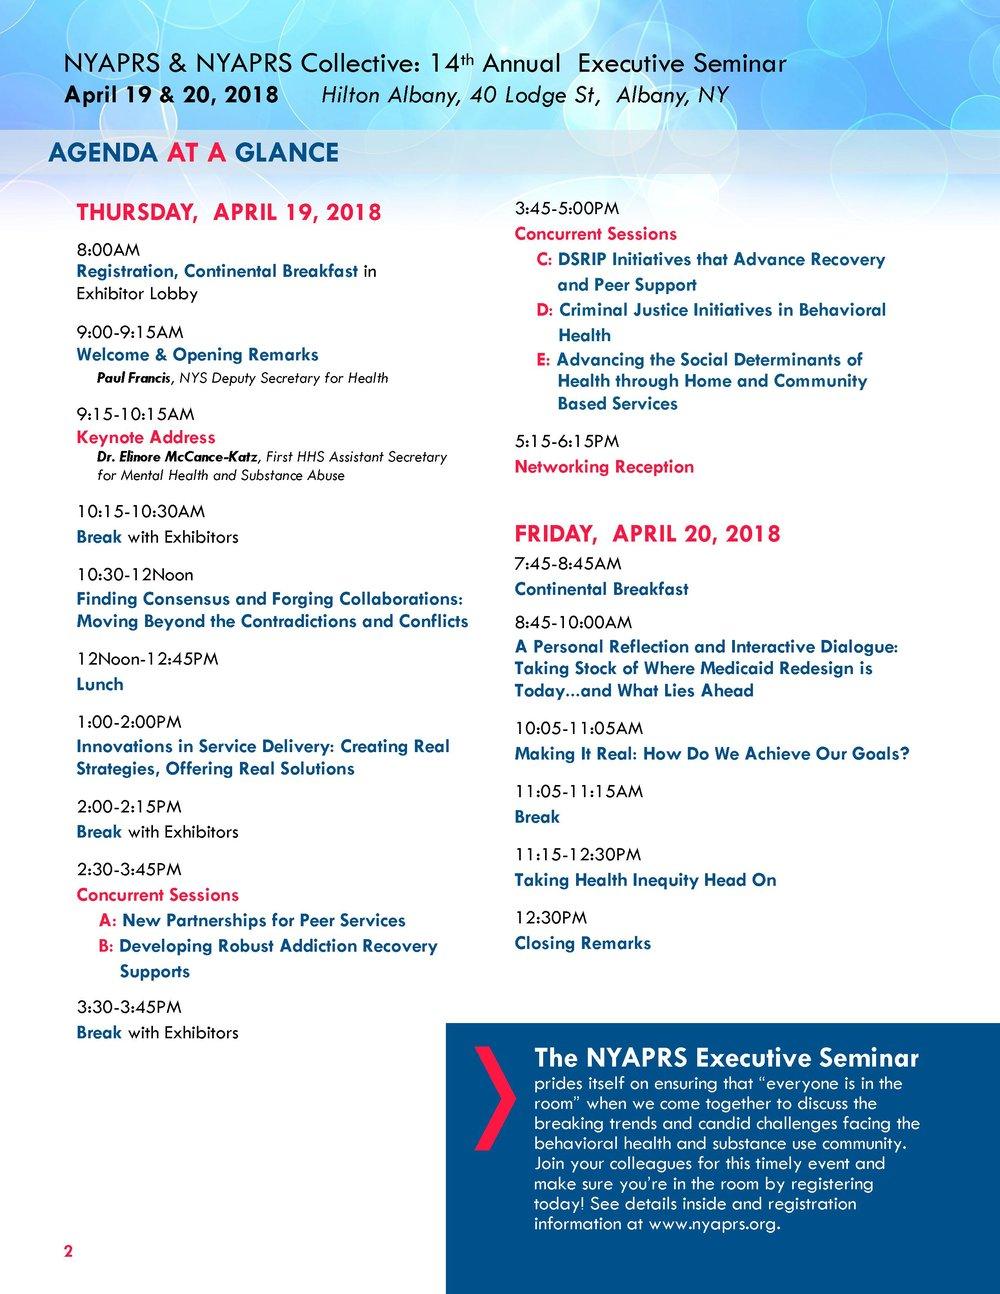 NYAPRS 2018 Program-2.jpg